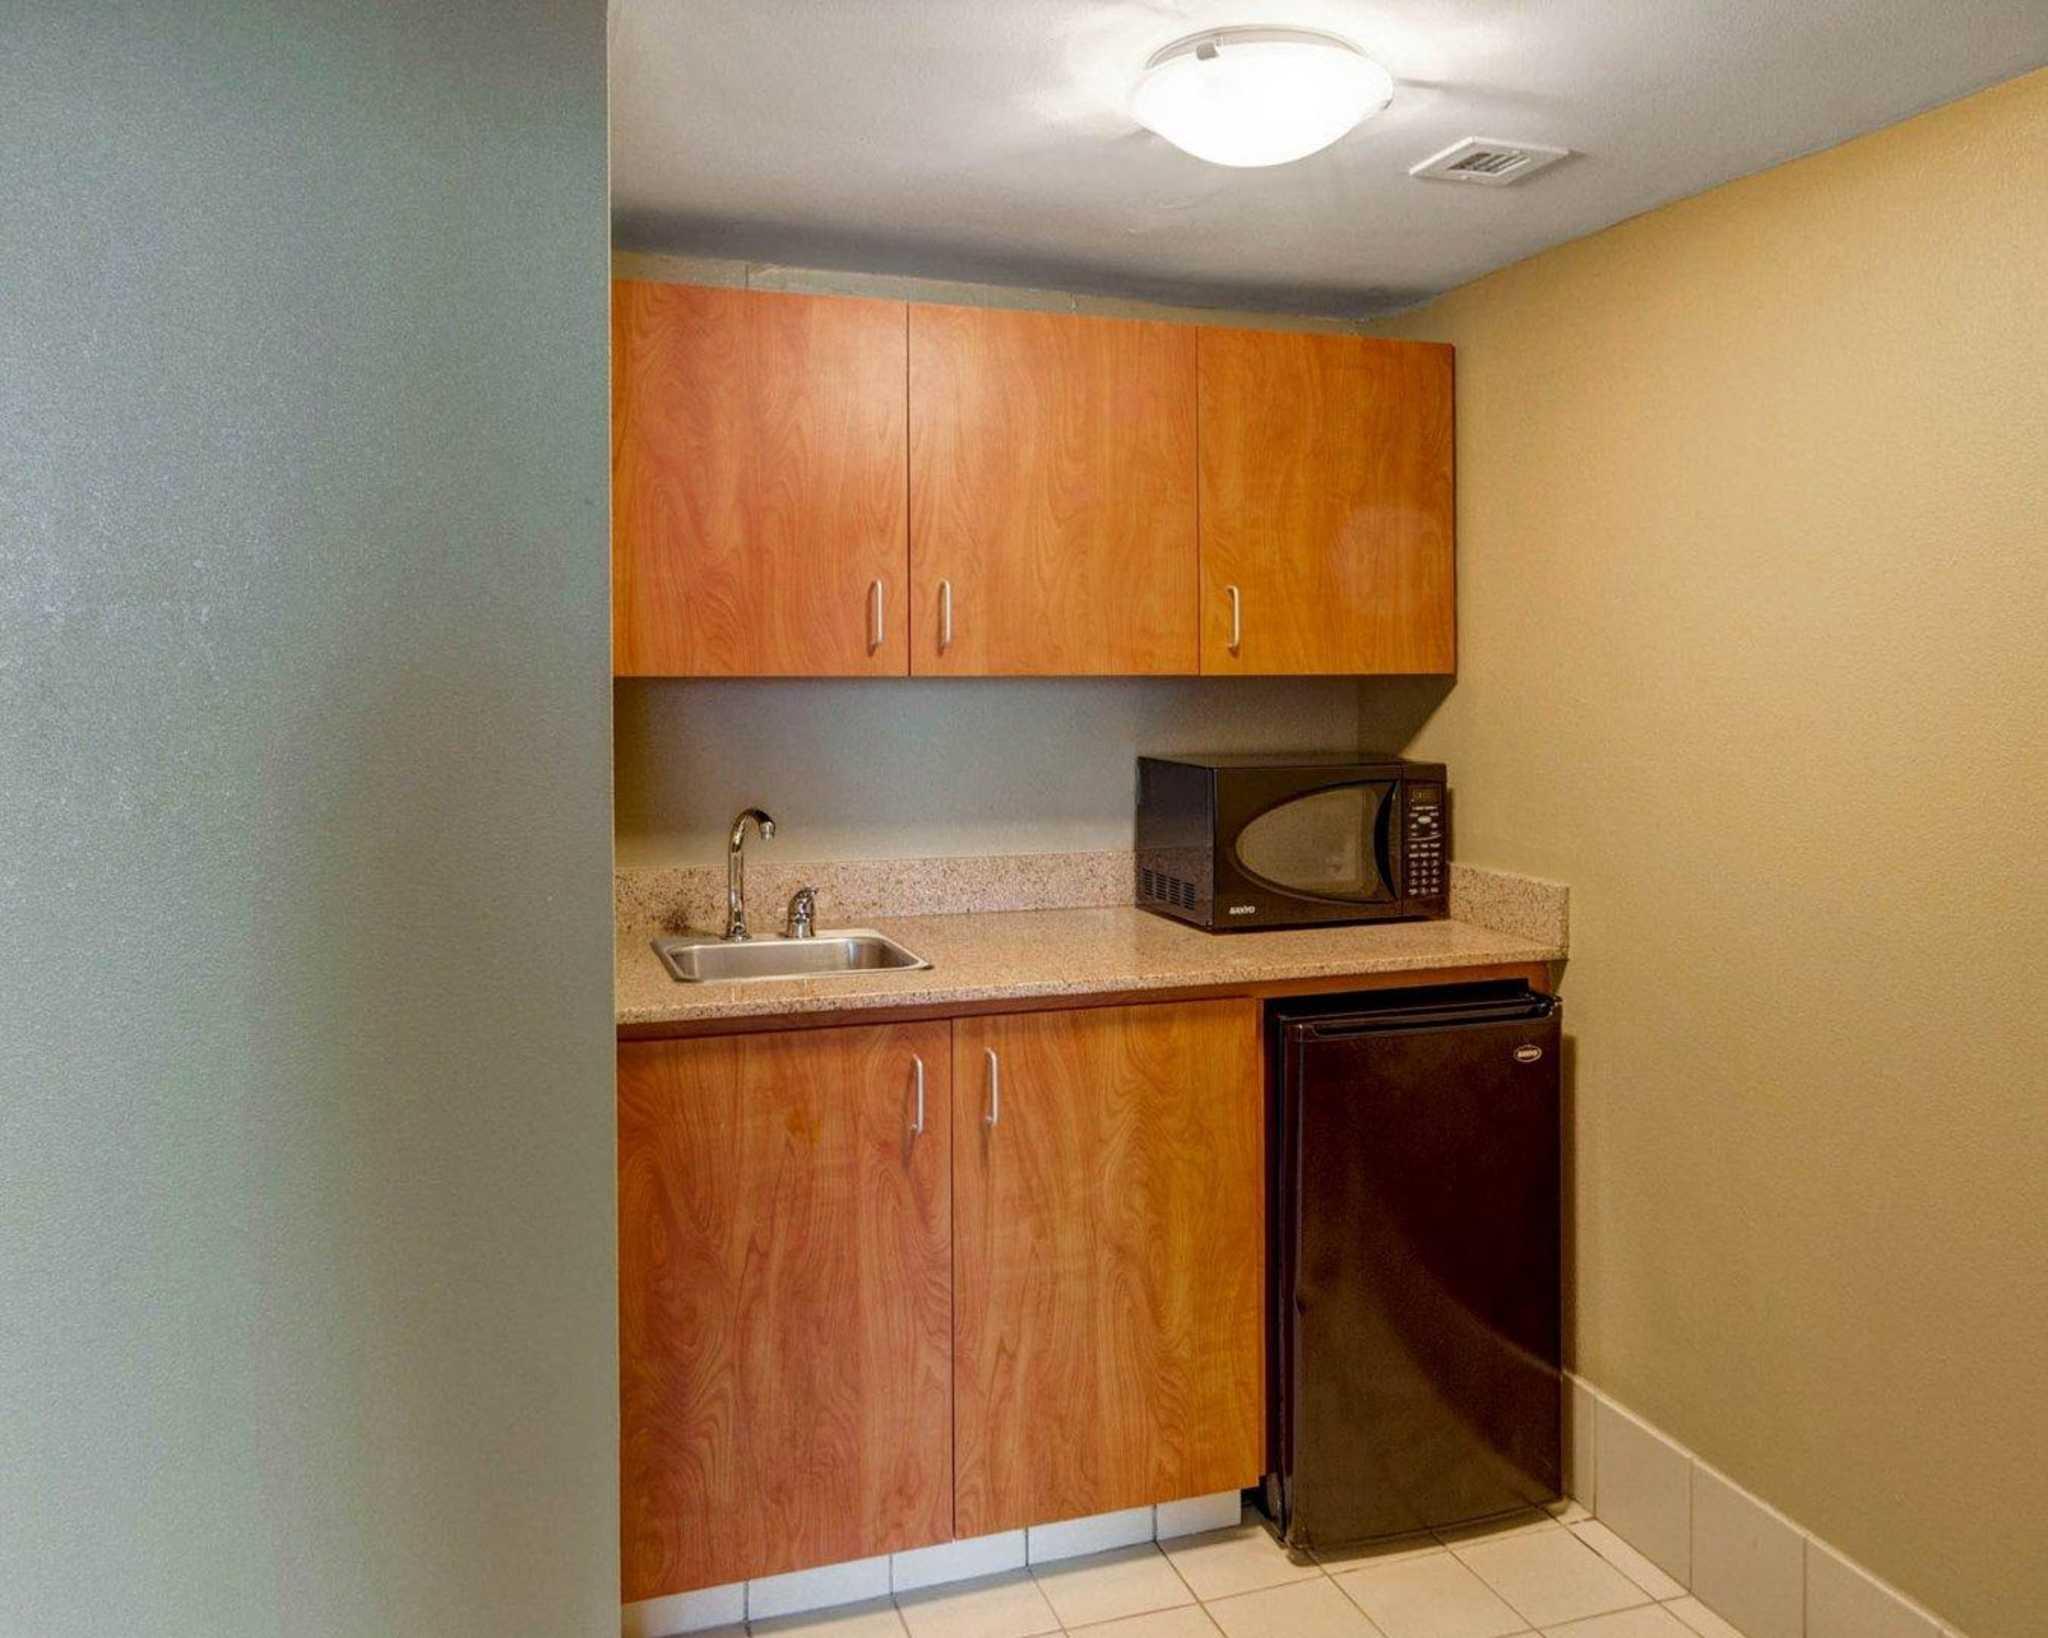 Comfort Inn & Suites Plano East image 47